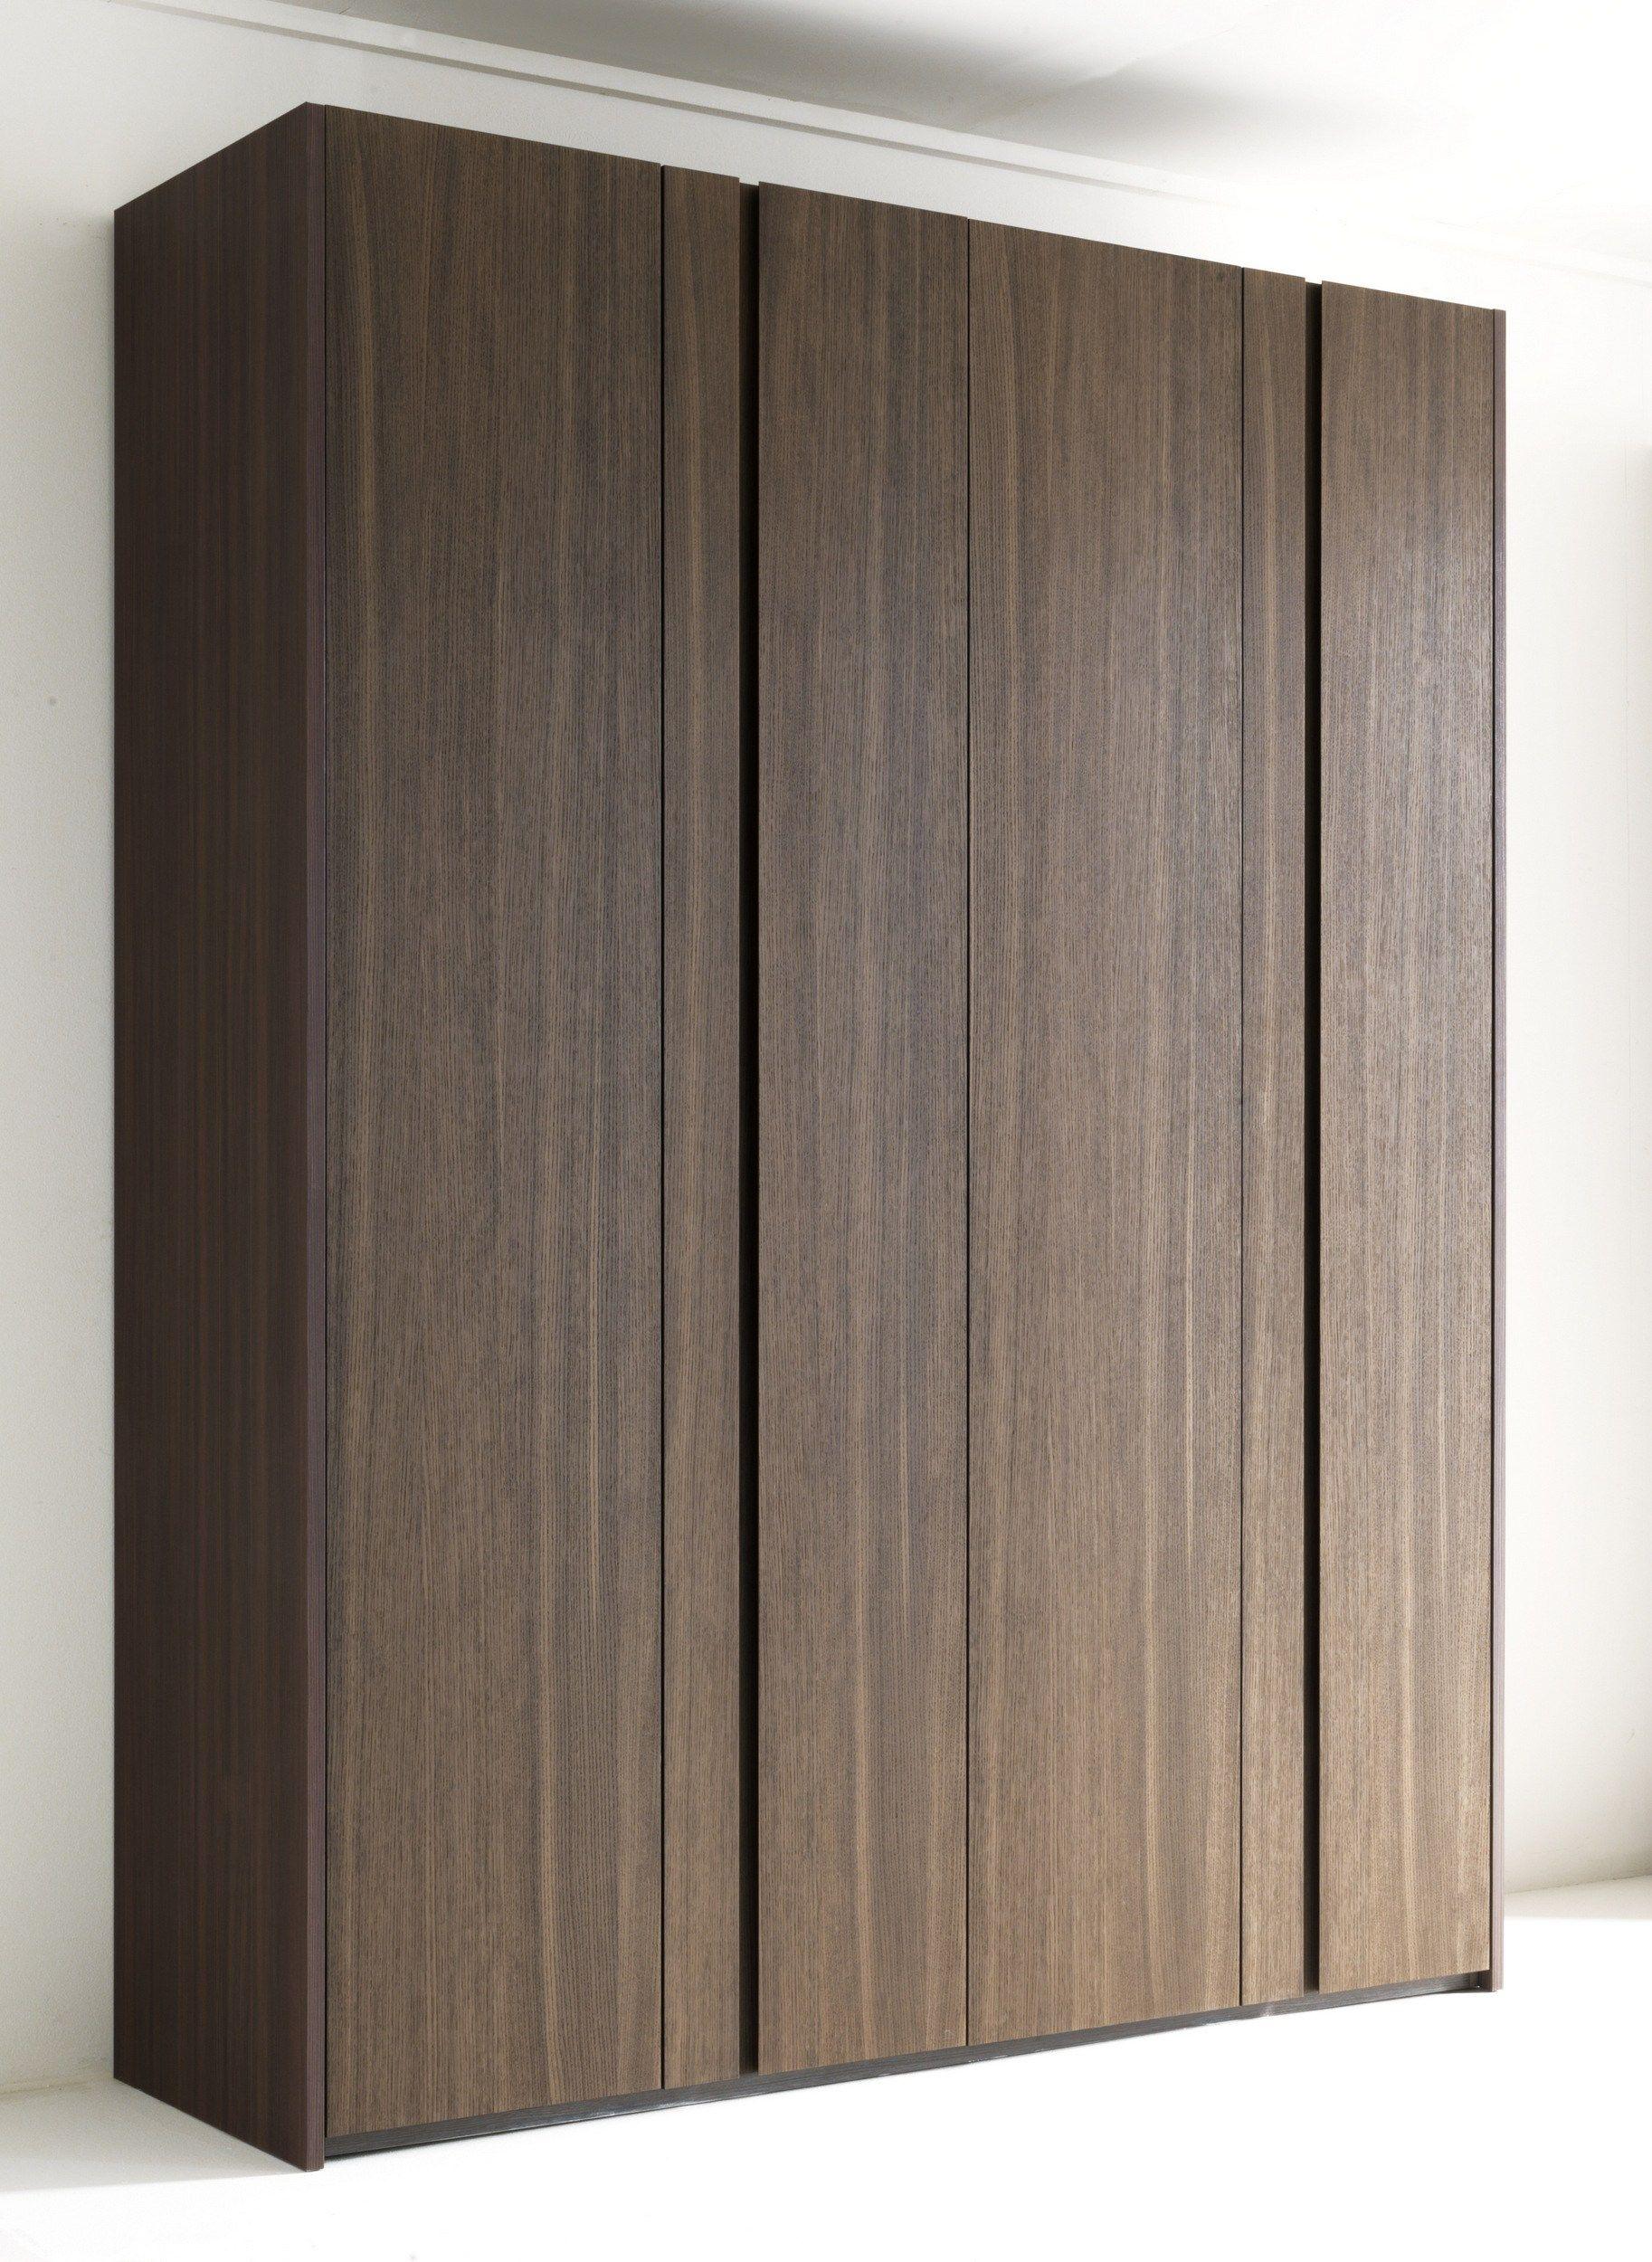 Wooden wardrobe custom NAICA Wardrobe Collection by Lema | design ...